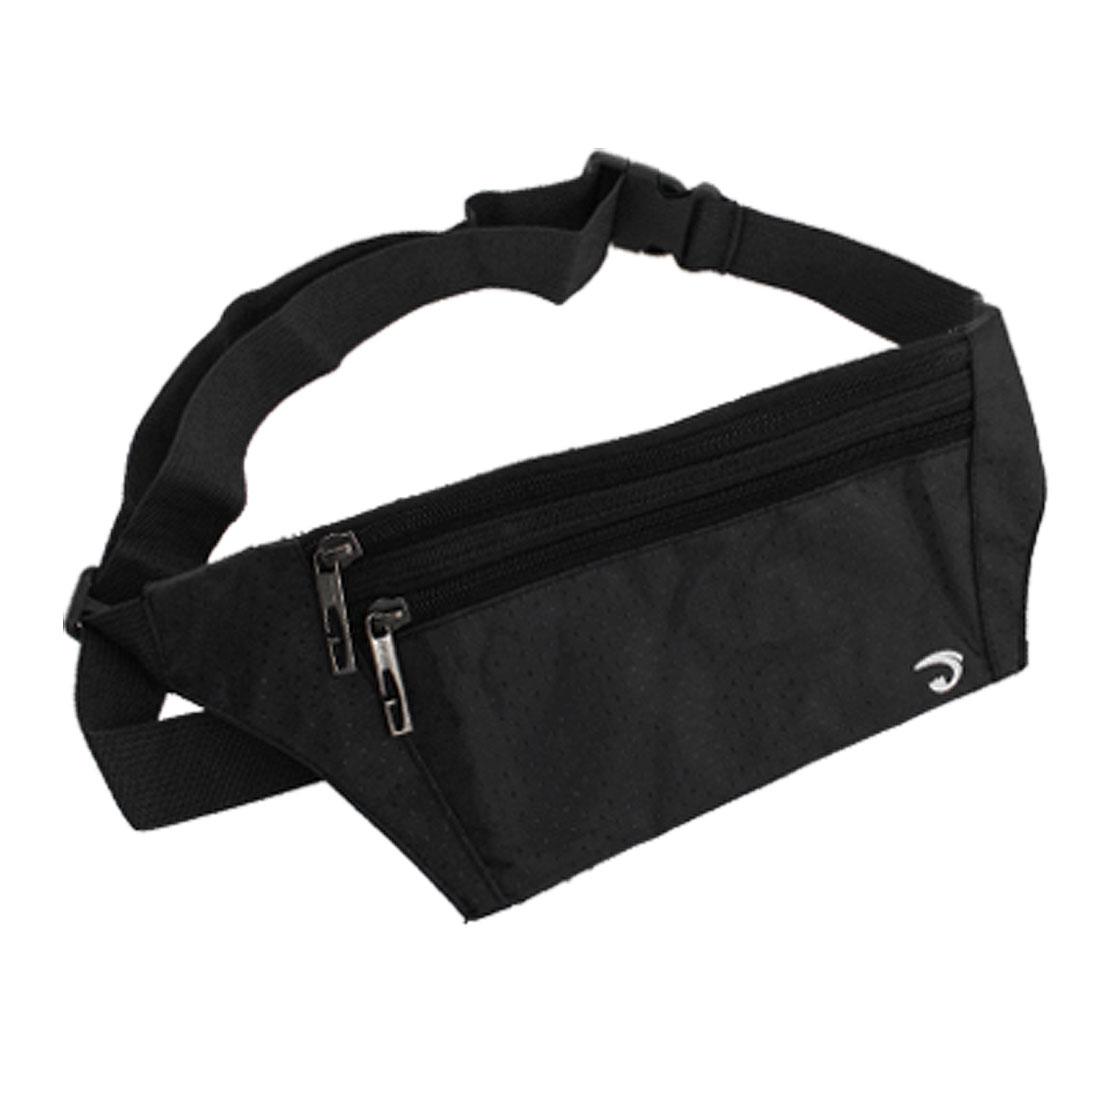 Black Argyle Print 3 Zipper Pockets Nylon Waist Bag Pouch for Man